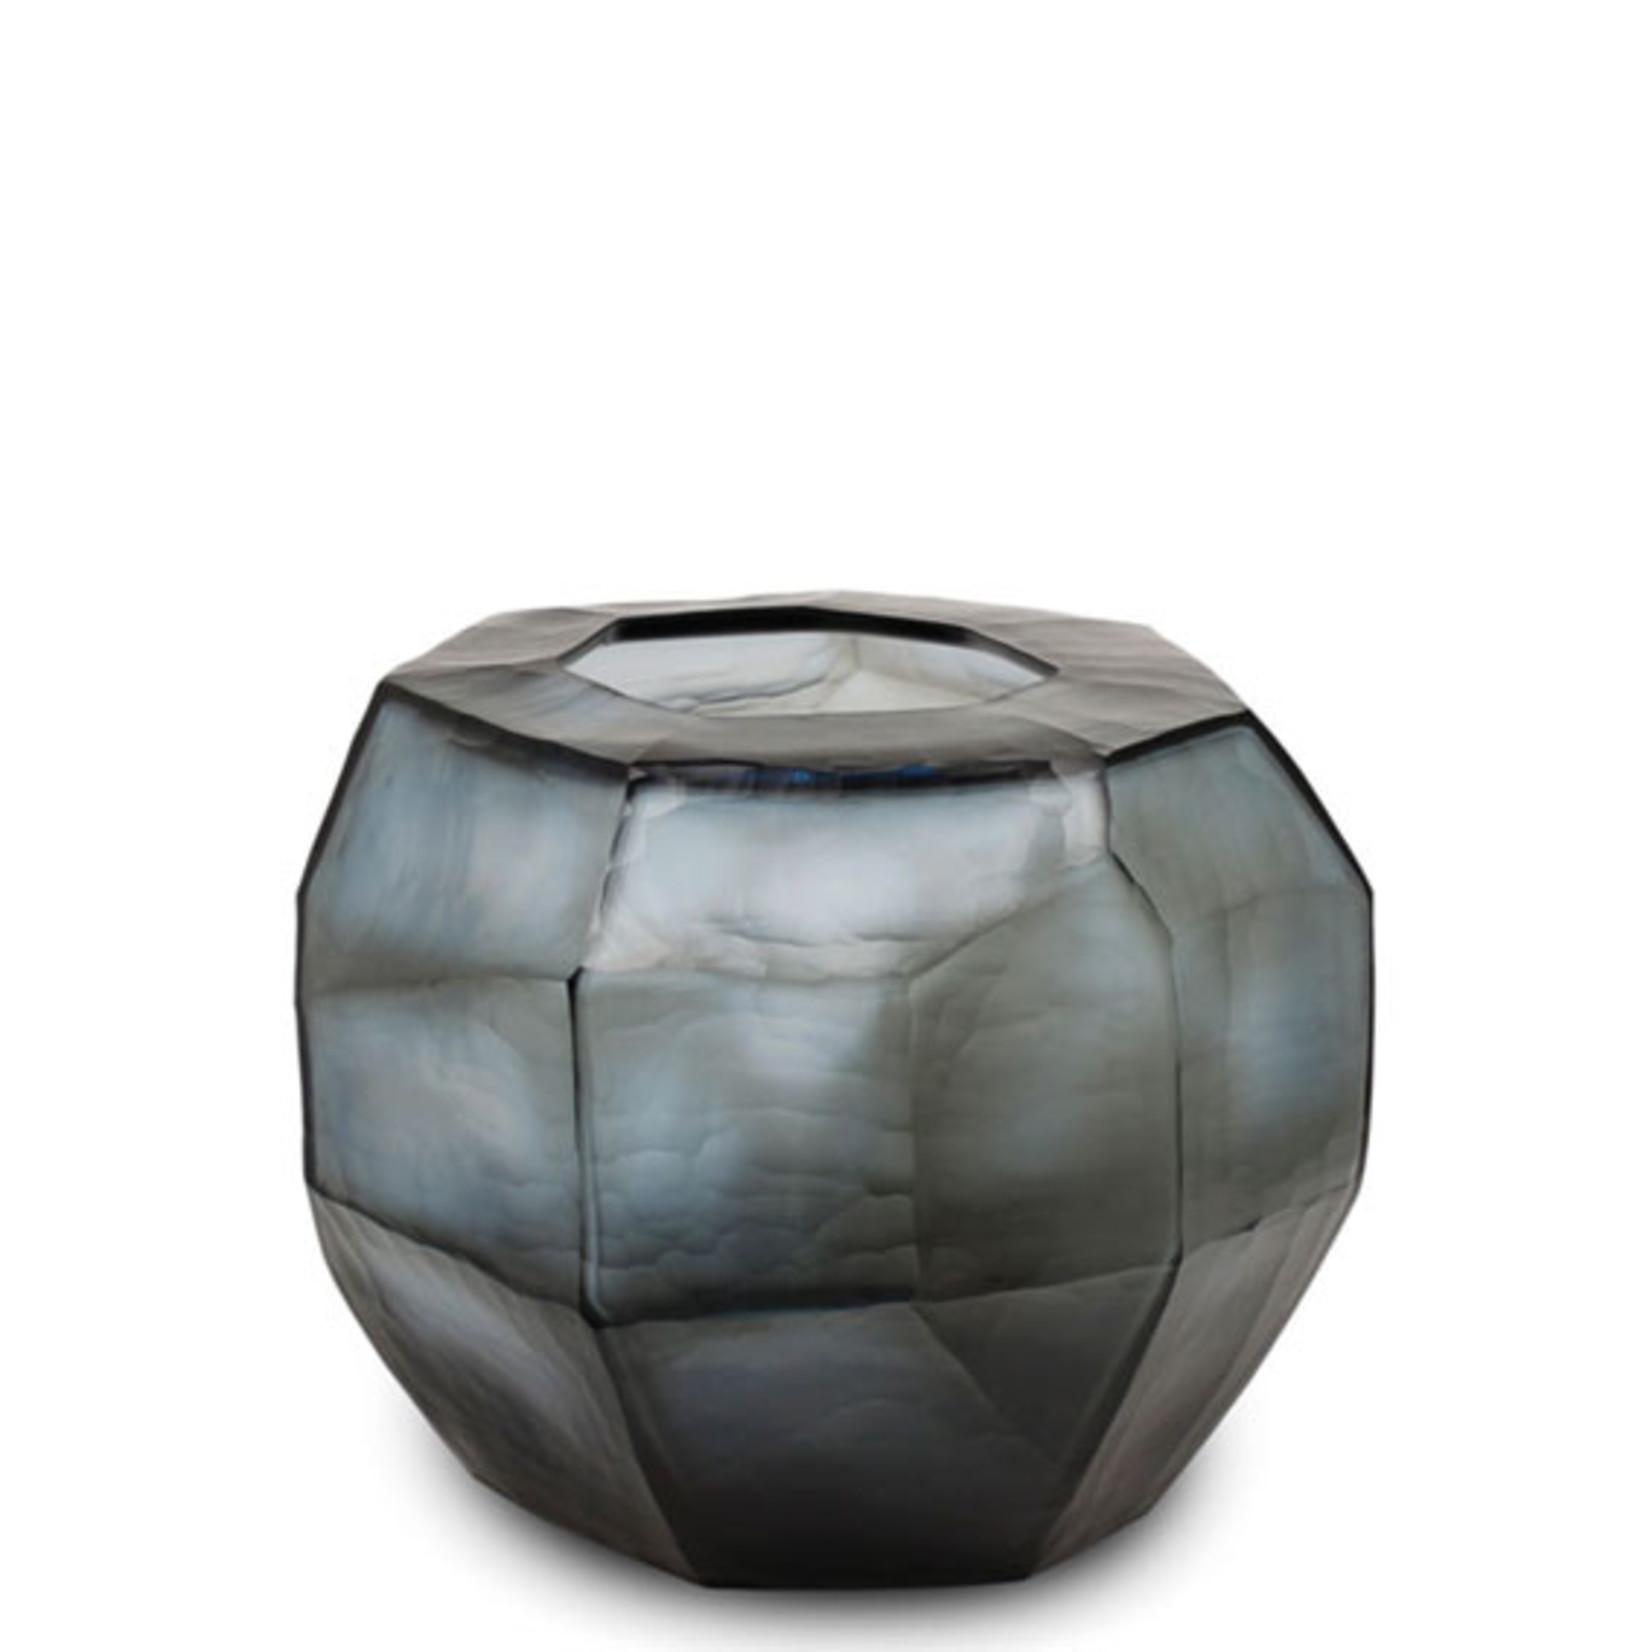 Guaxs Vaas Cubistic Round | Indigo / Smokegrey